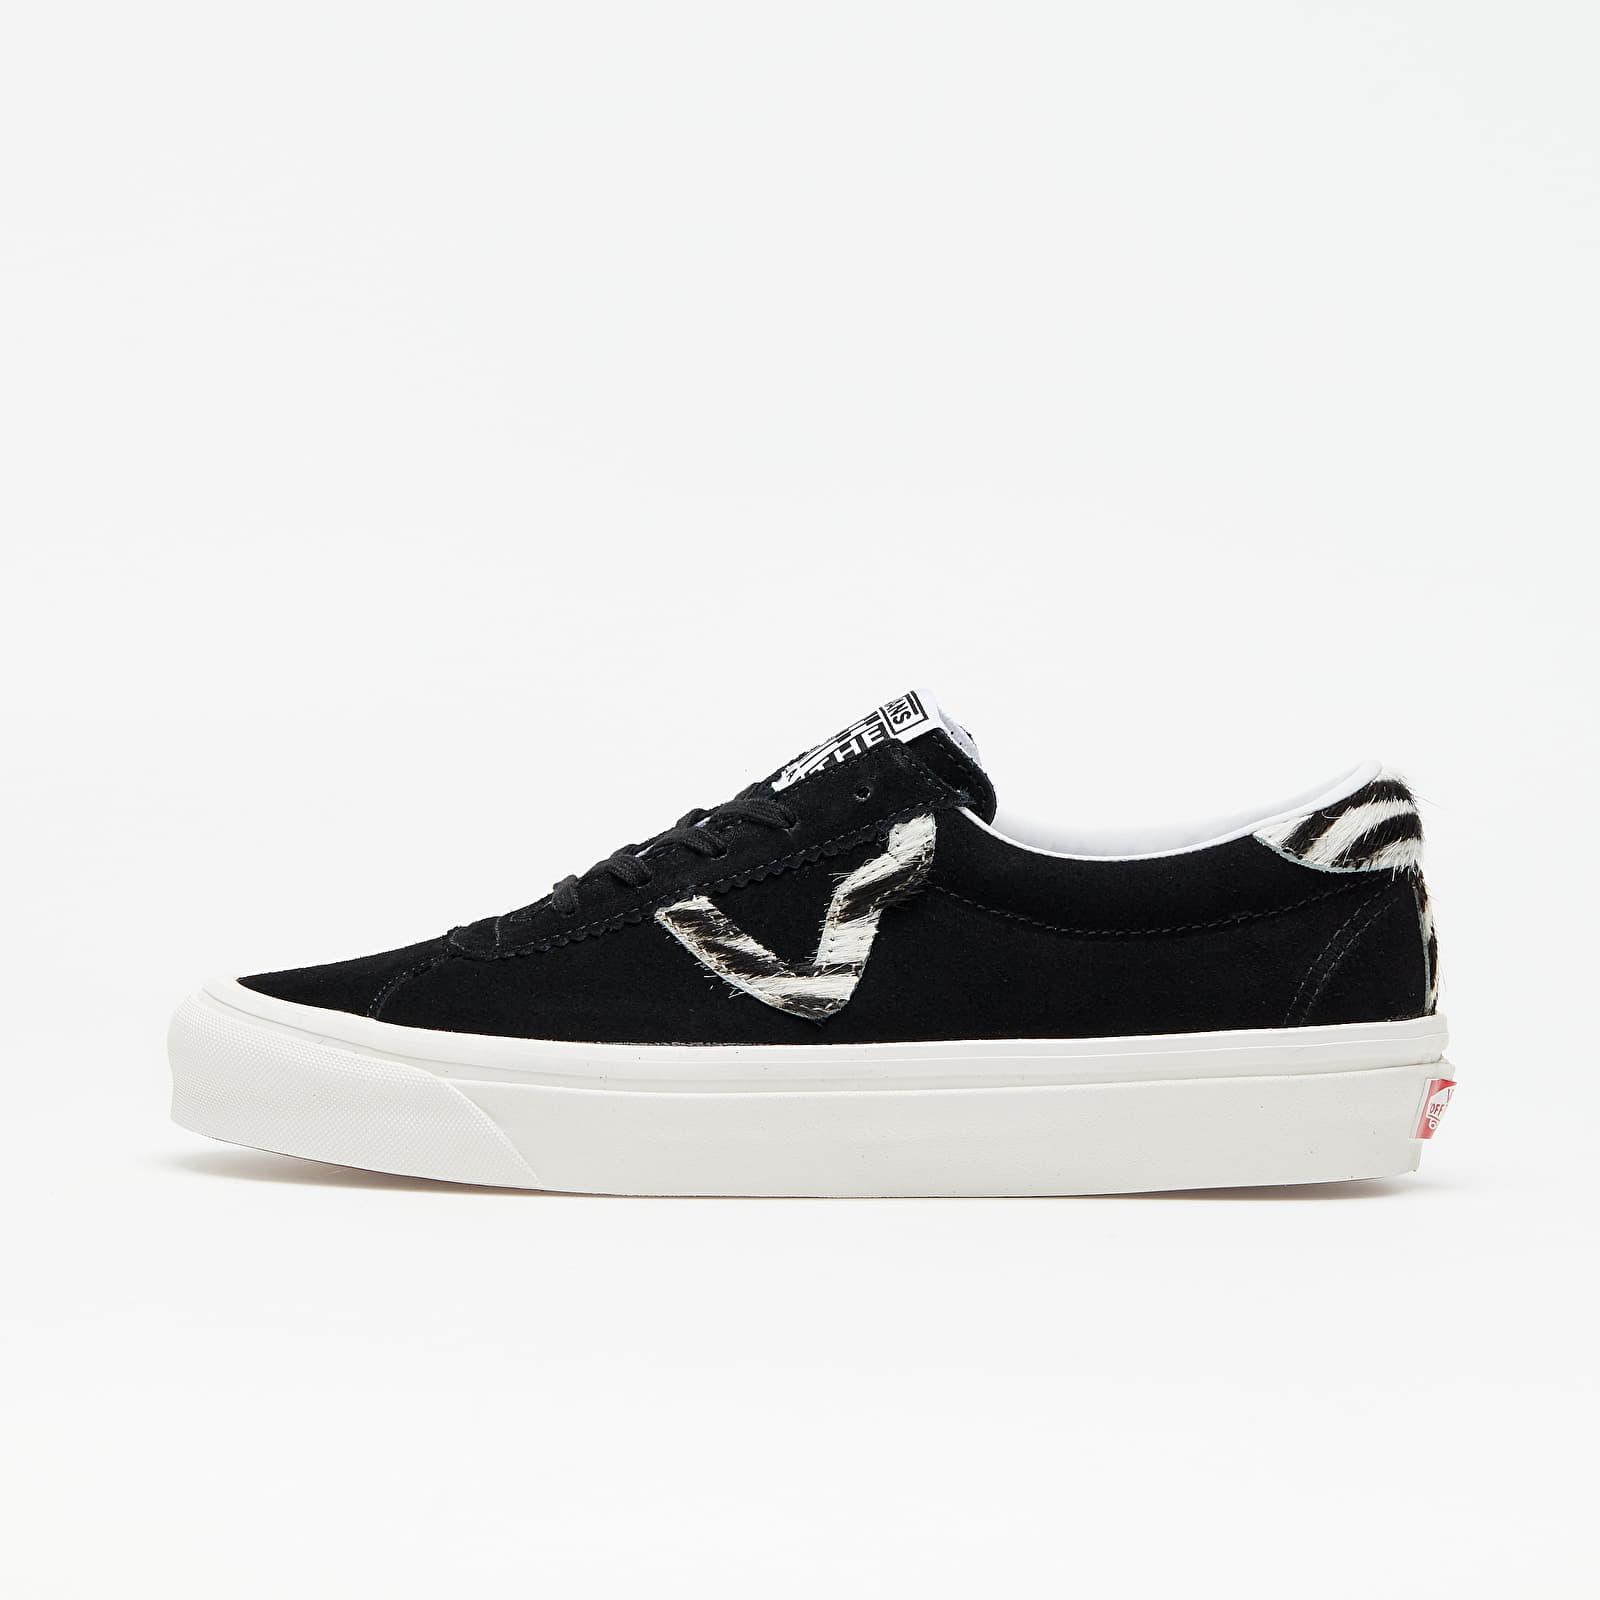 Vans Style 73 DX (Anaheim Factory) Black/ Zebra VN0A3WLQ4ZD1